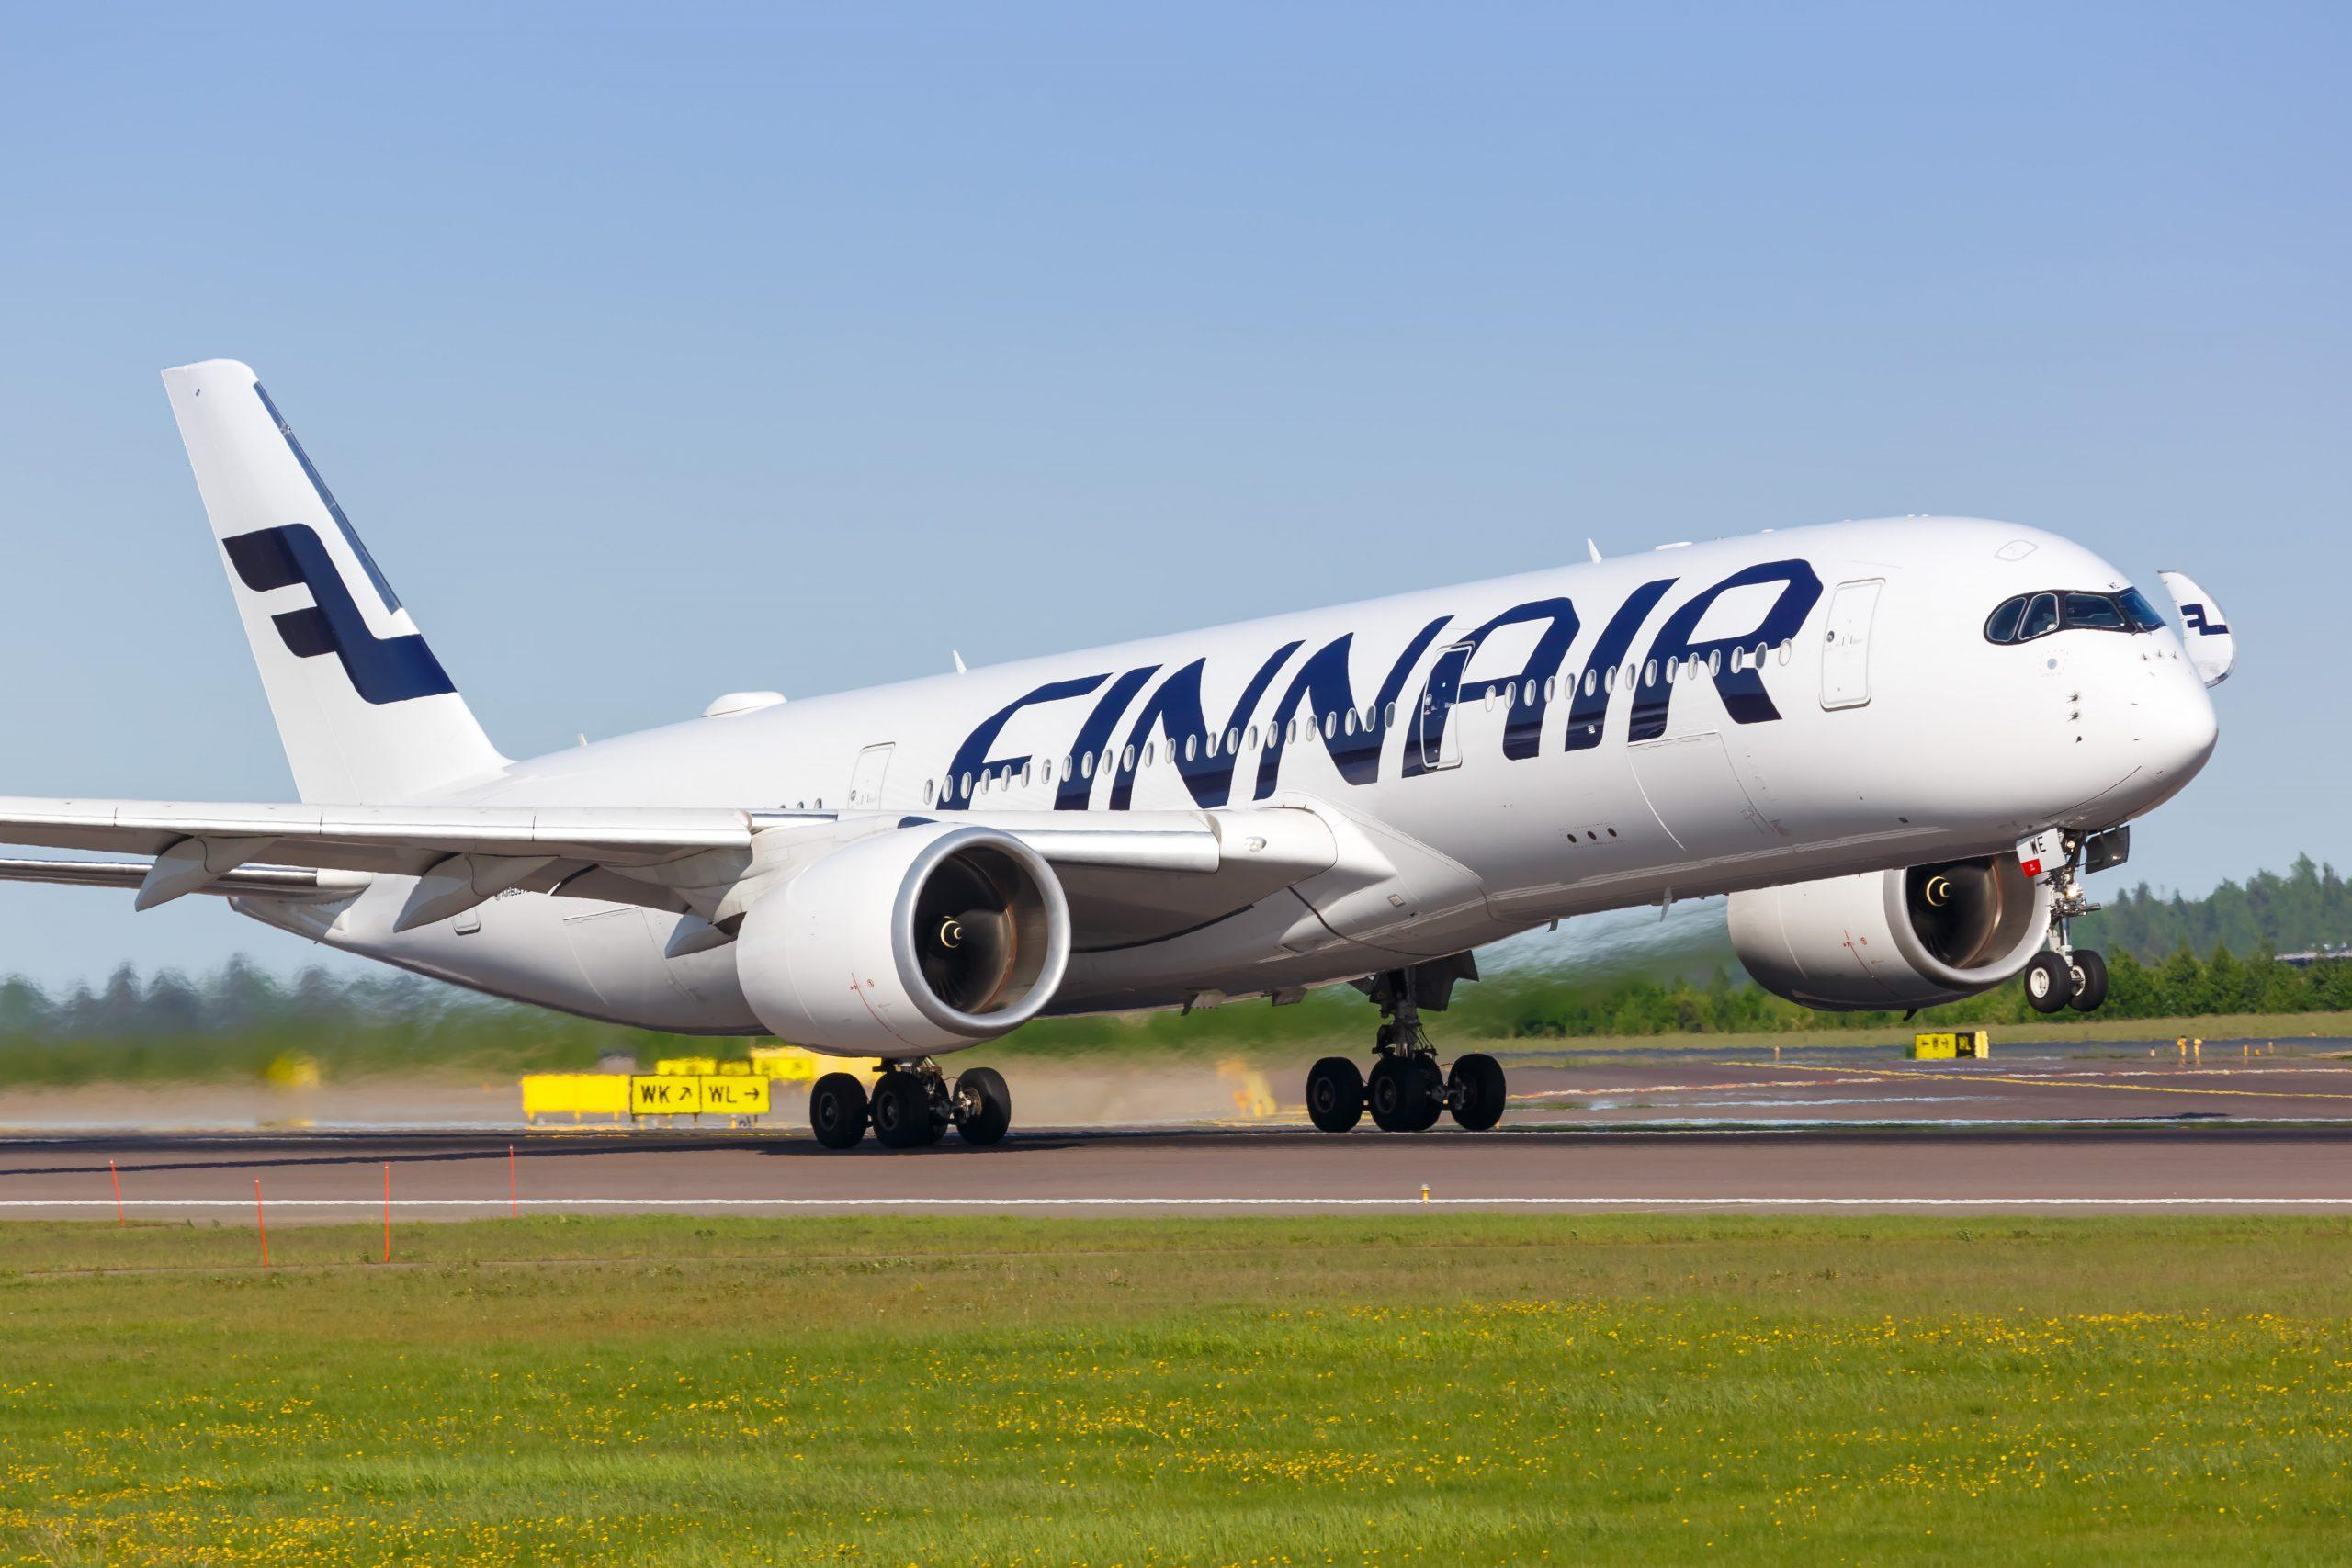 Airbus A350-900 fra Finnair. (Foto: Markus Mainka | Shutterstock)